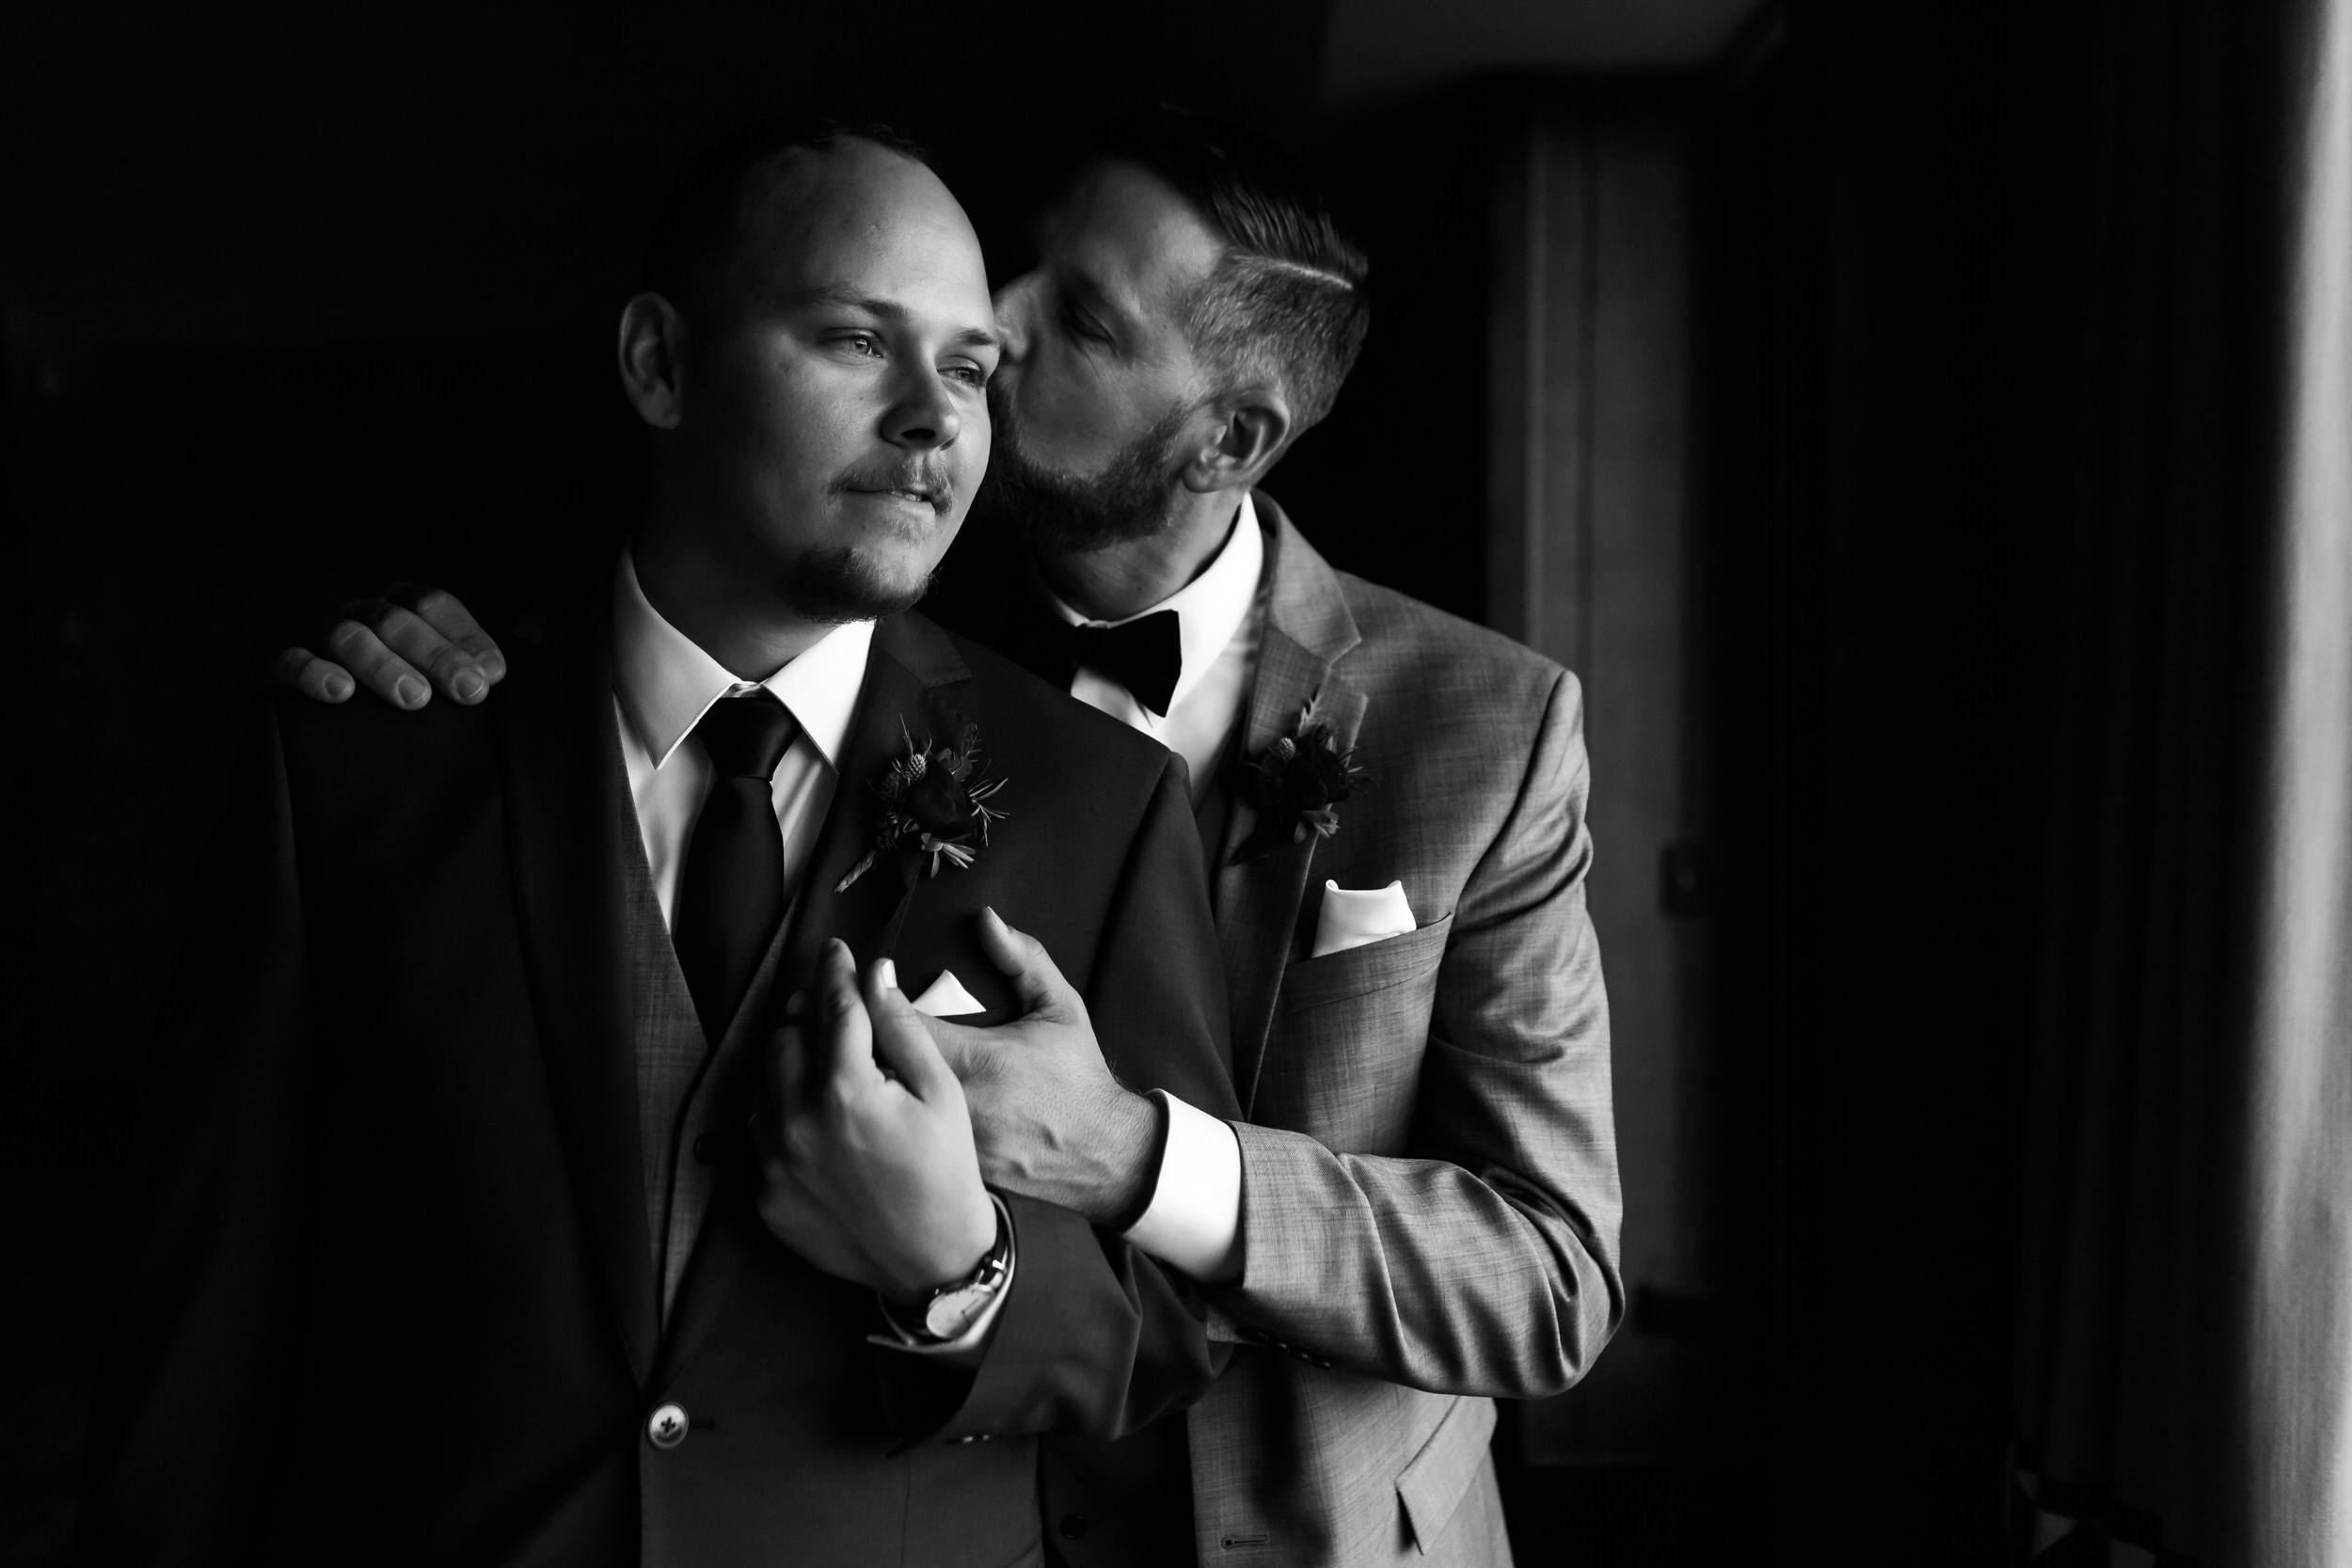 timberline_lodge_wedding_JCwedding_006